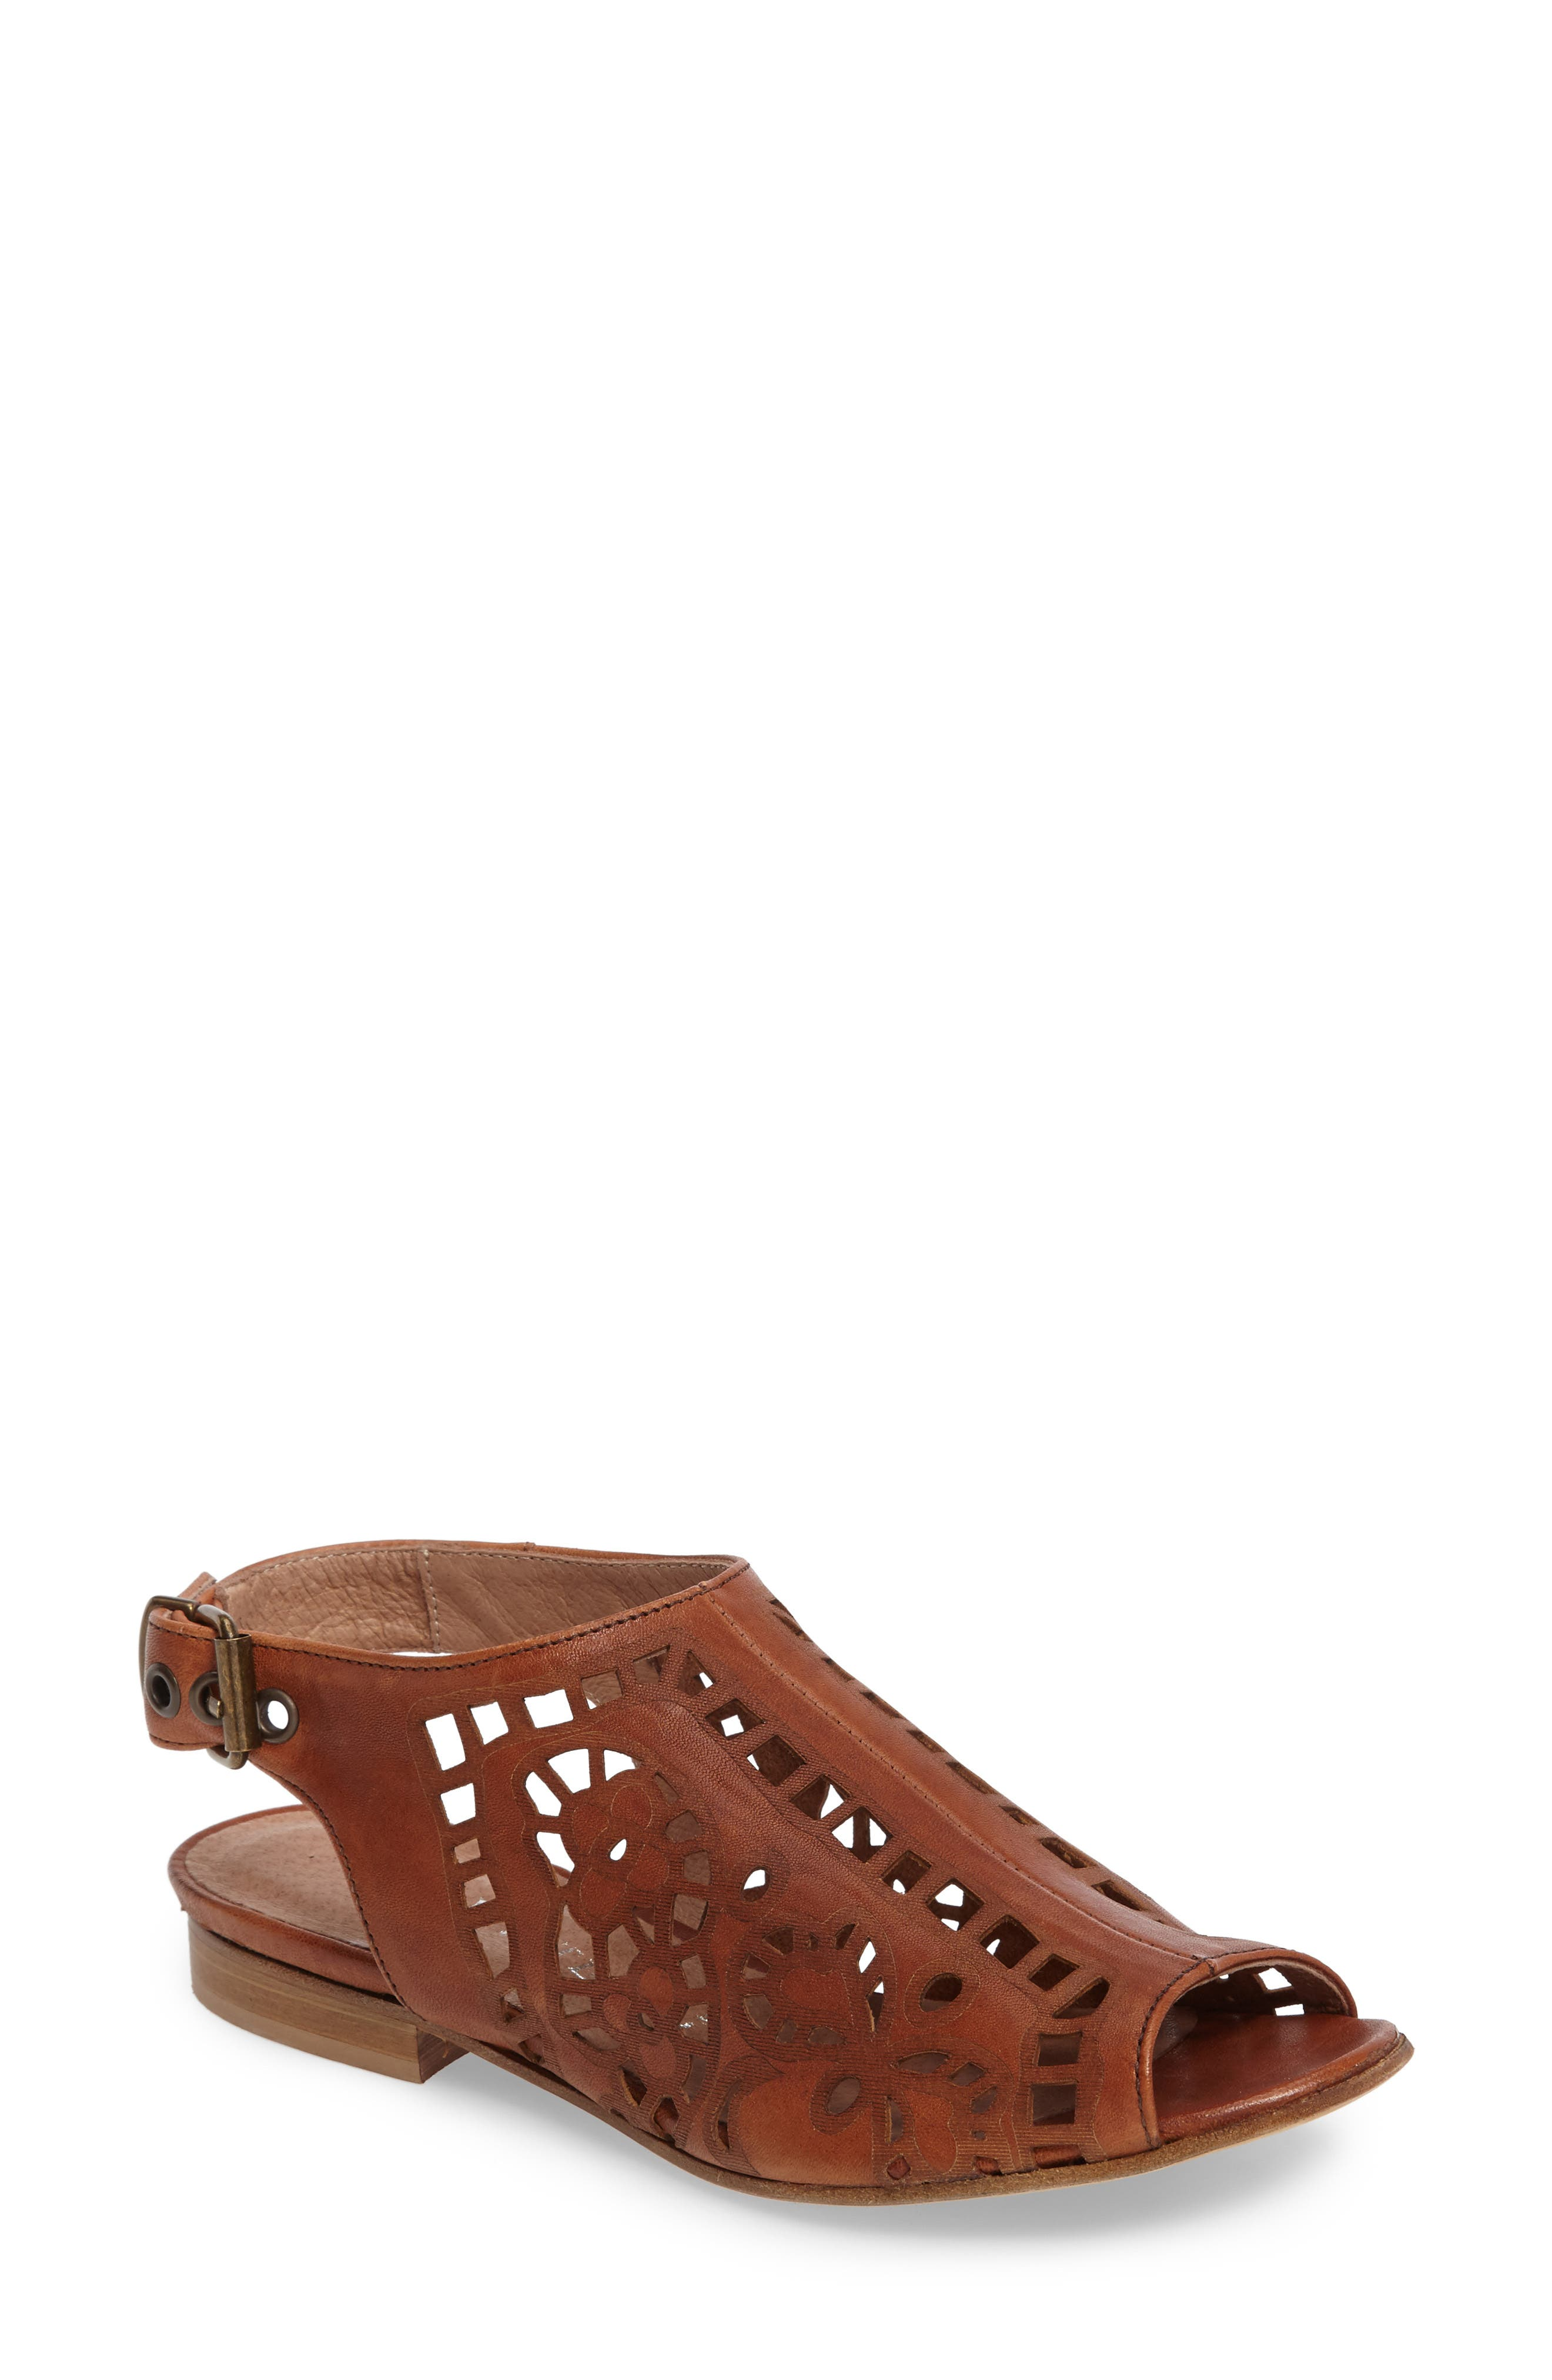 Ally Slingback Sandal,                             Main thumbnail 1, color,                             Cognac Leather